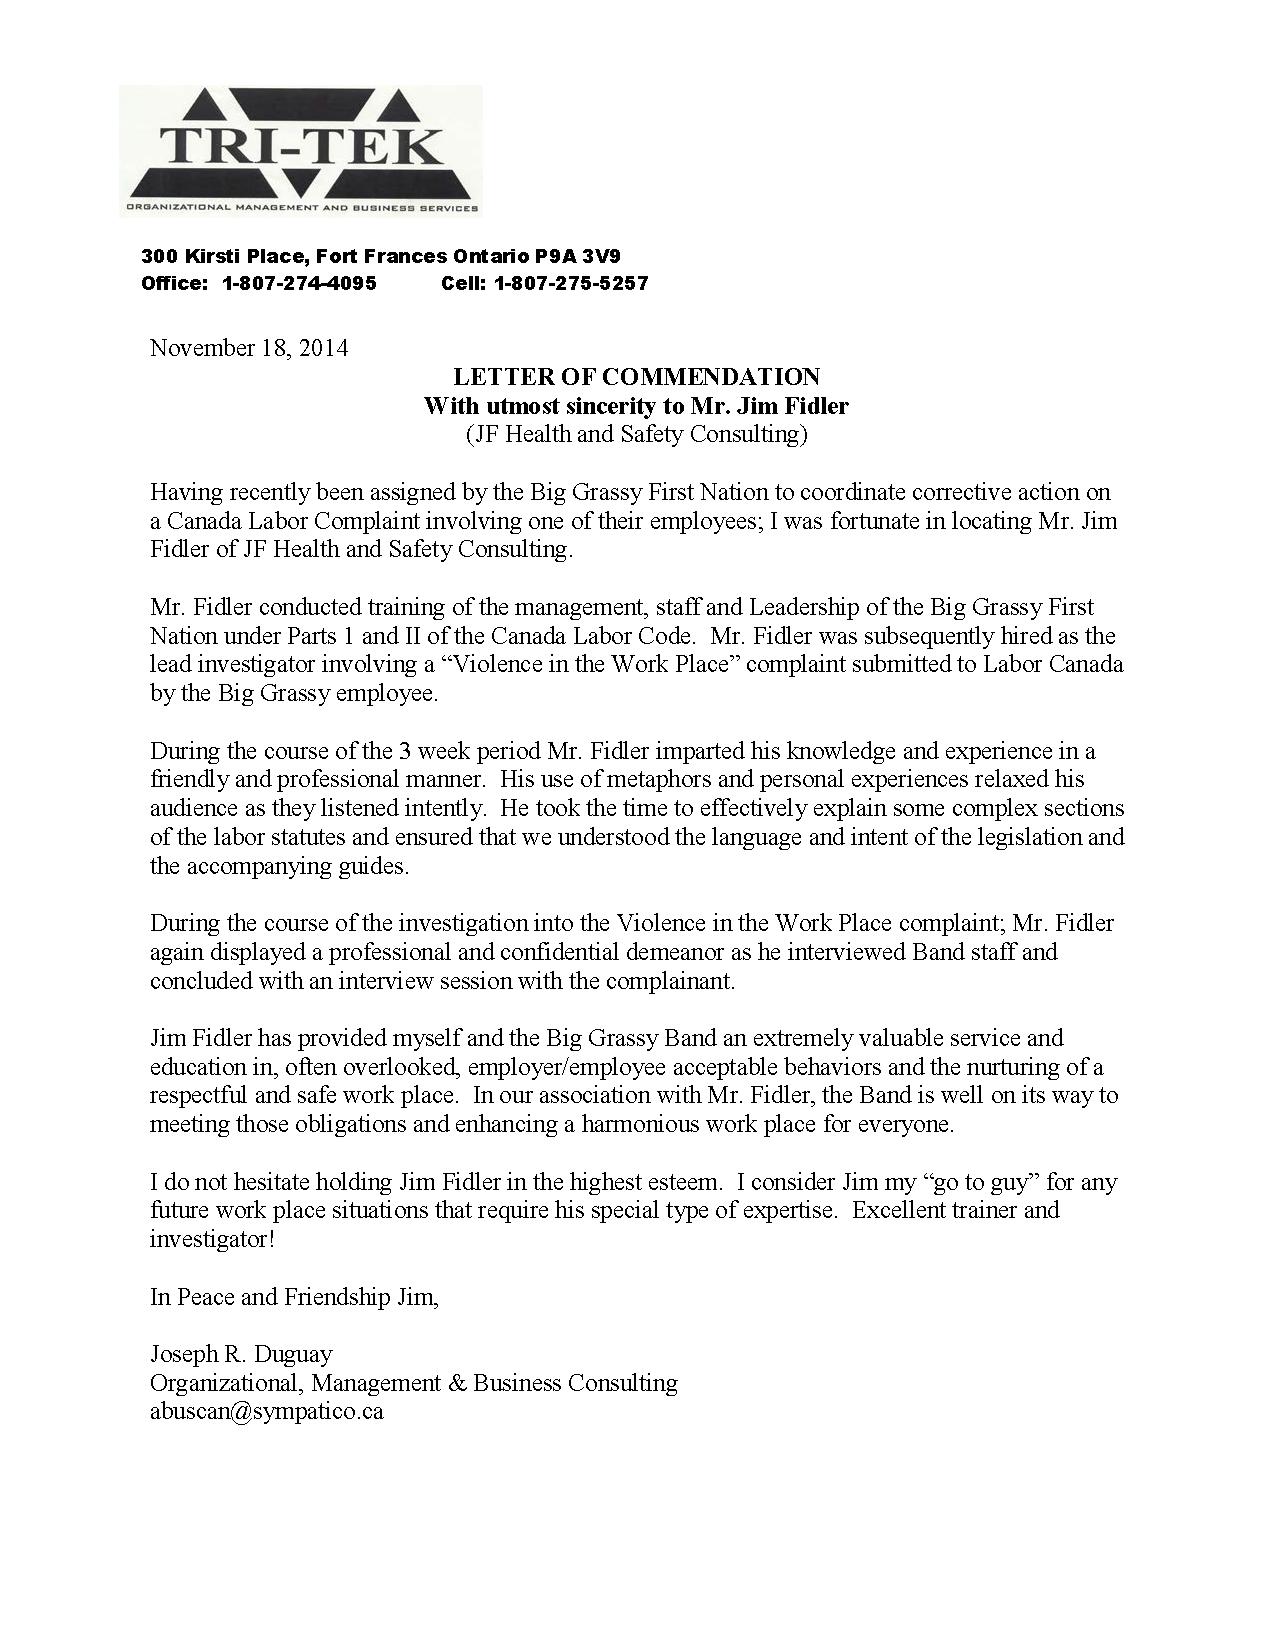 Letter of Commendation to Jim Fidler